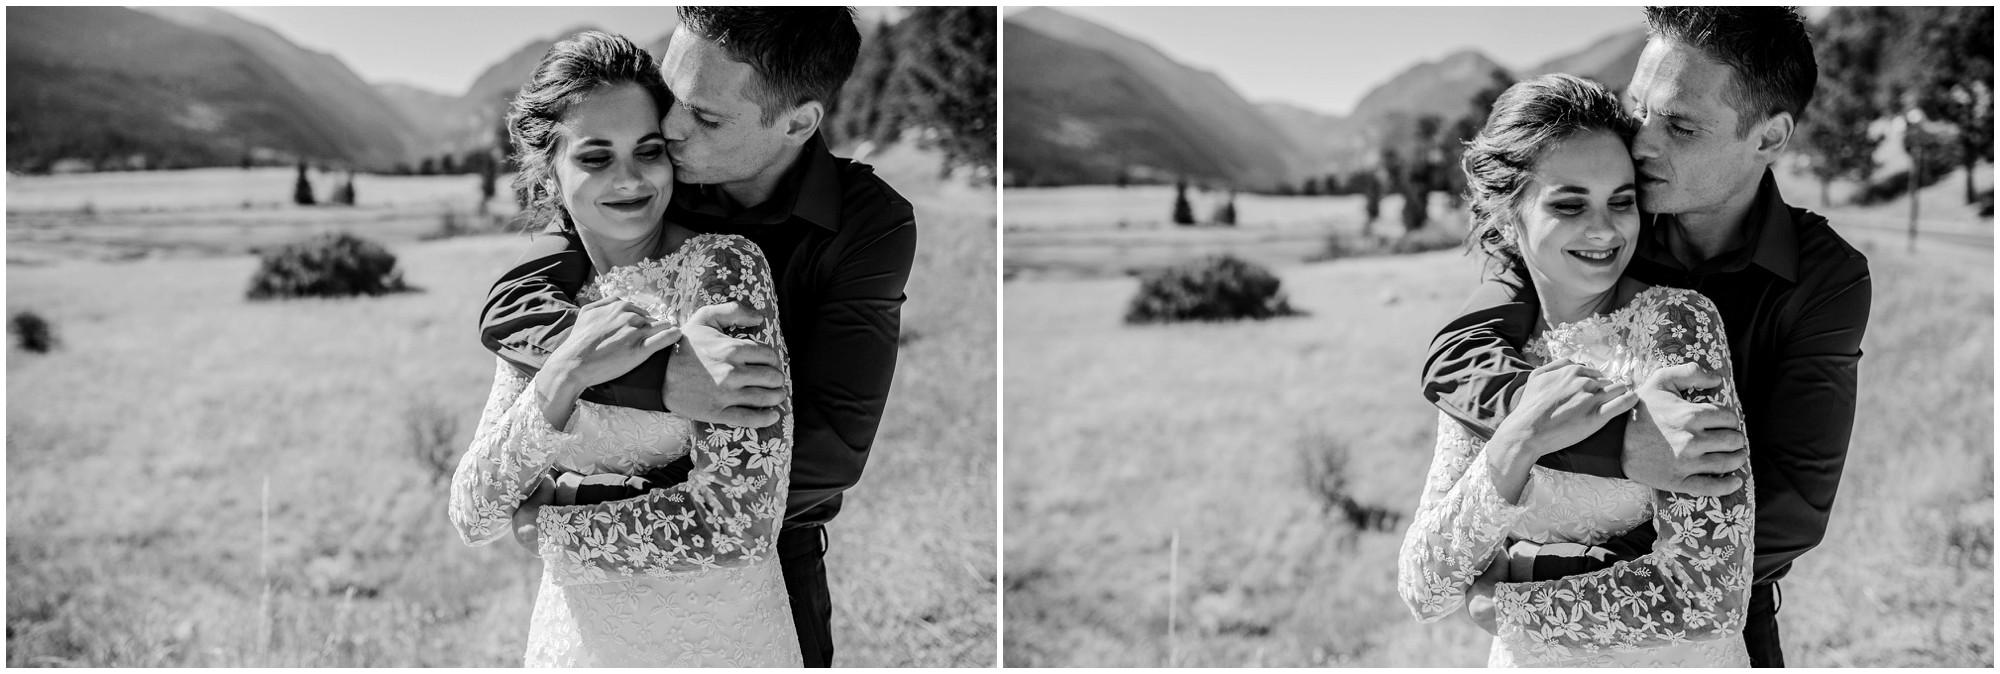 Colorado elopement Photos in Estes Park